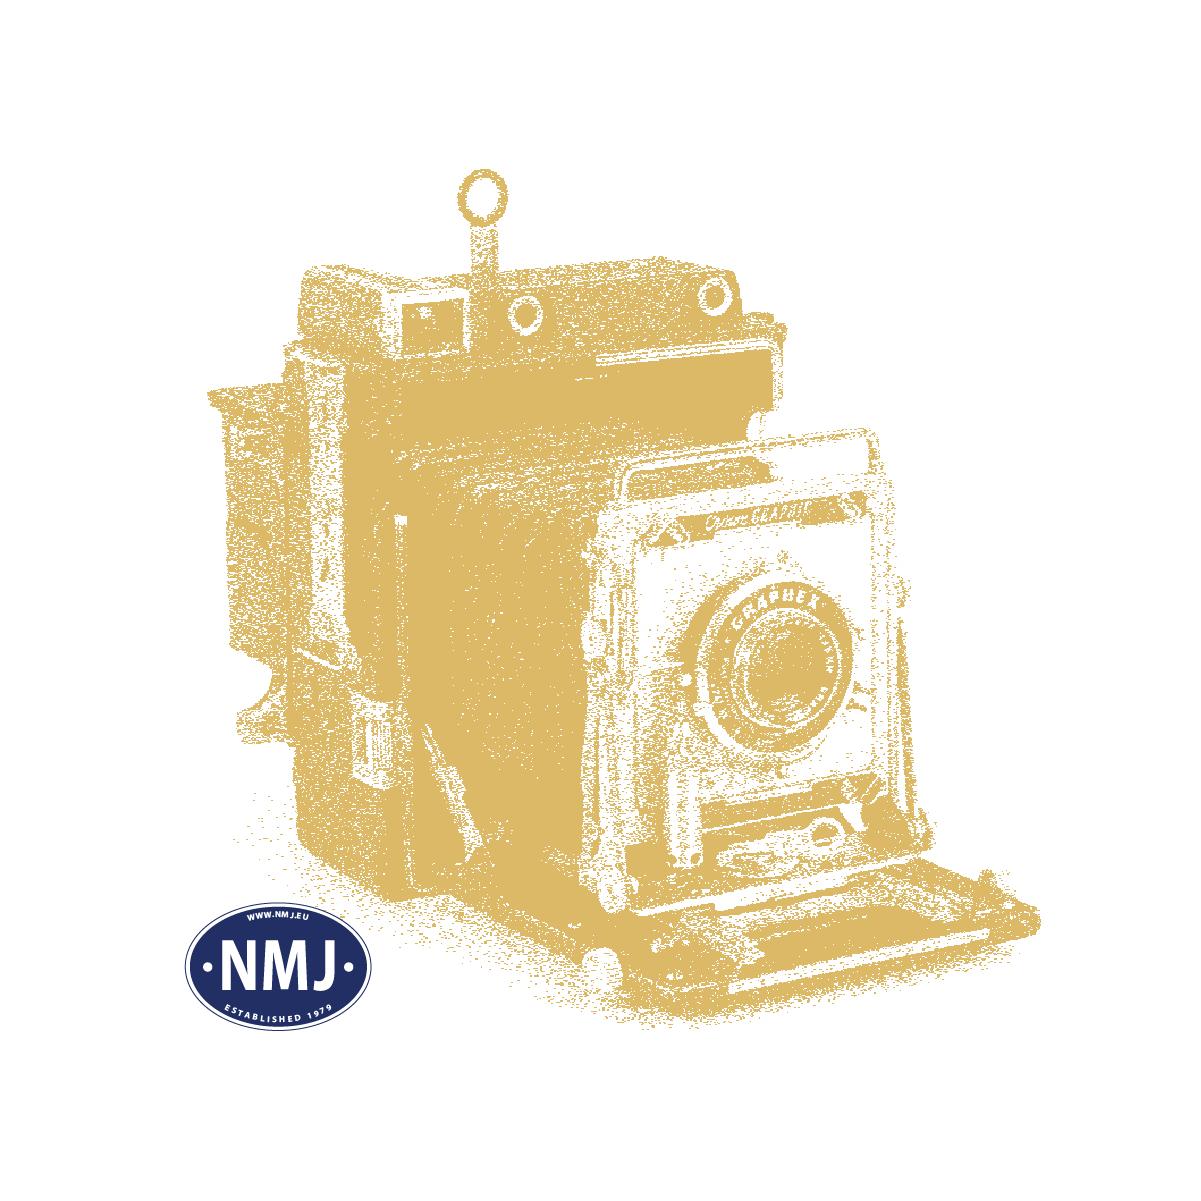 NMJB1134 - NMJ Holzladung, 2 Stk